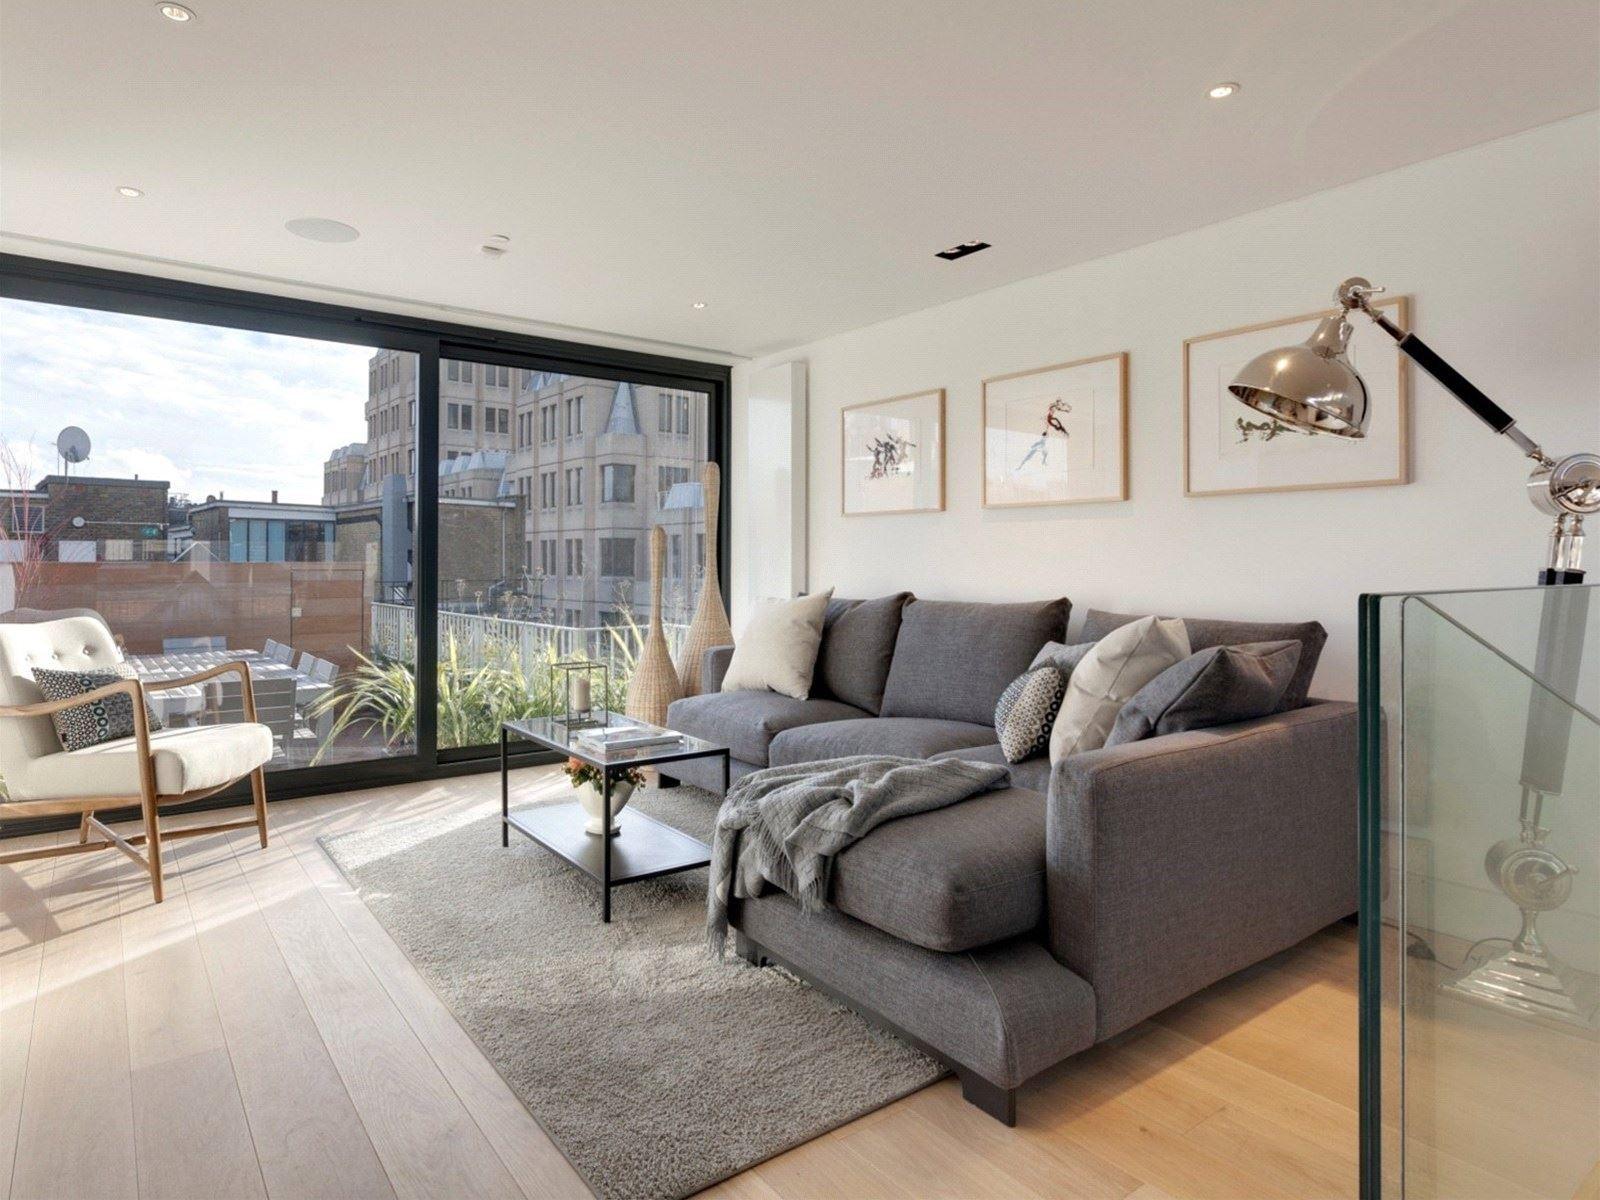 4 bedroom House for sale in Betterton